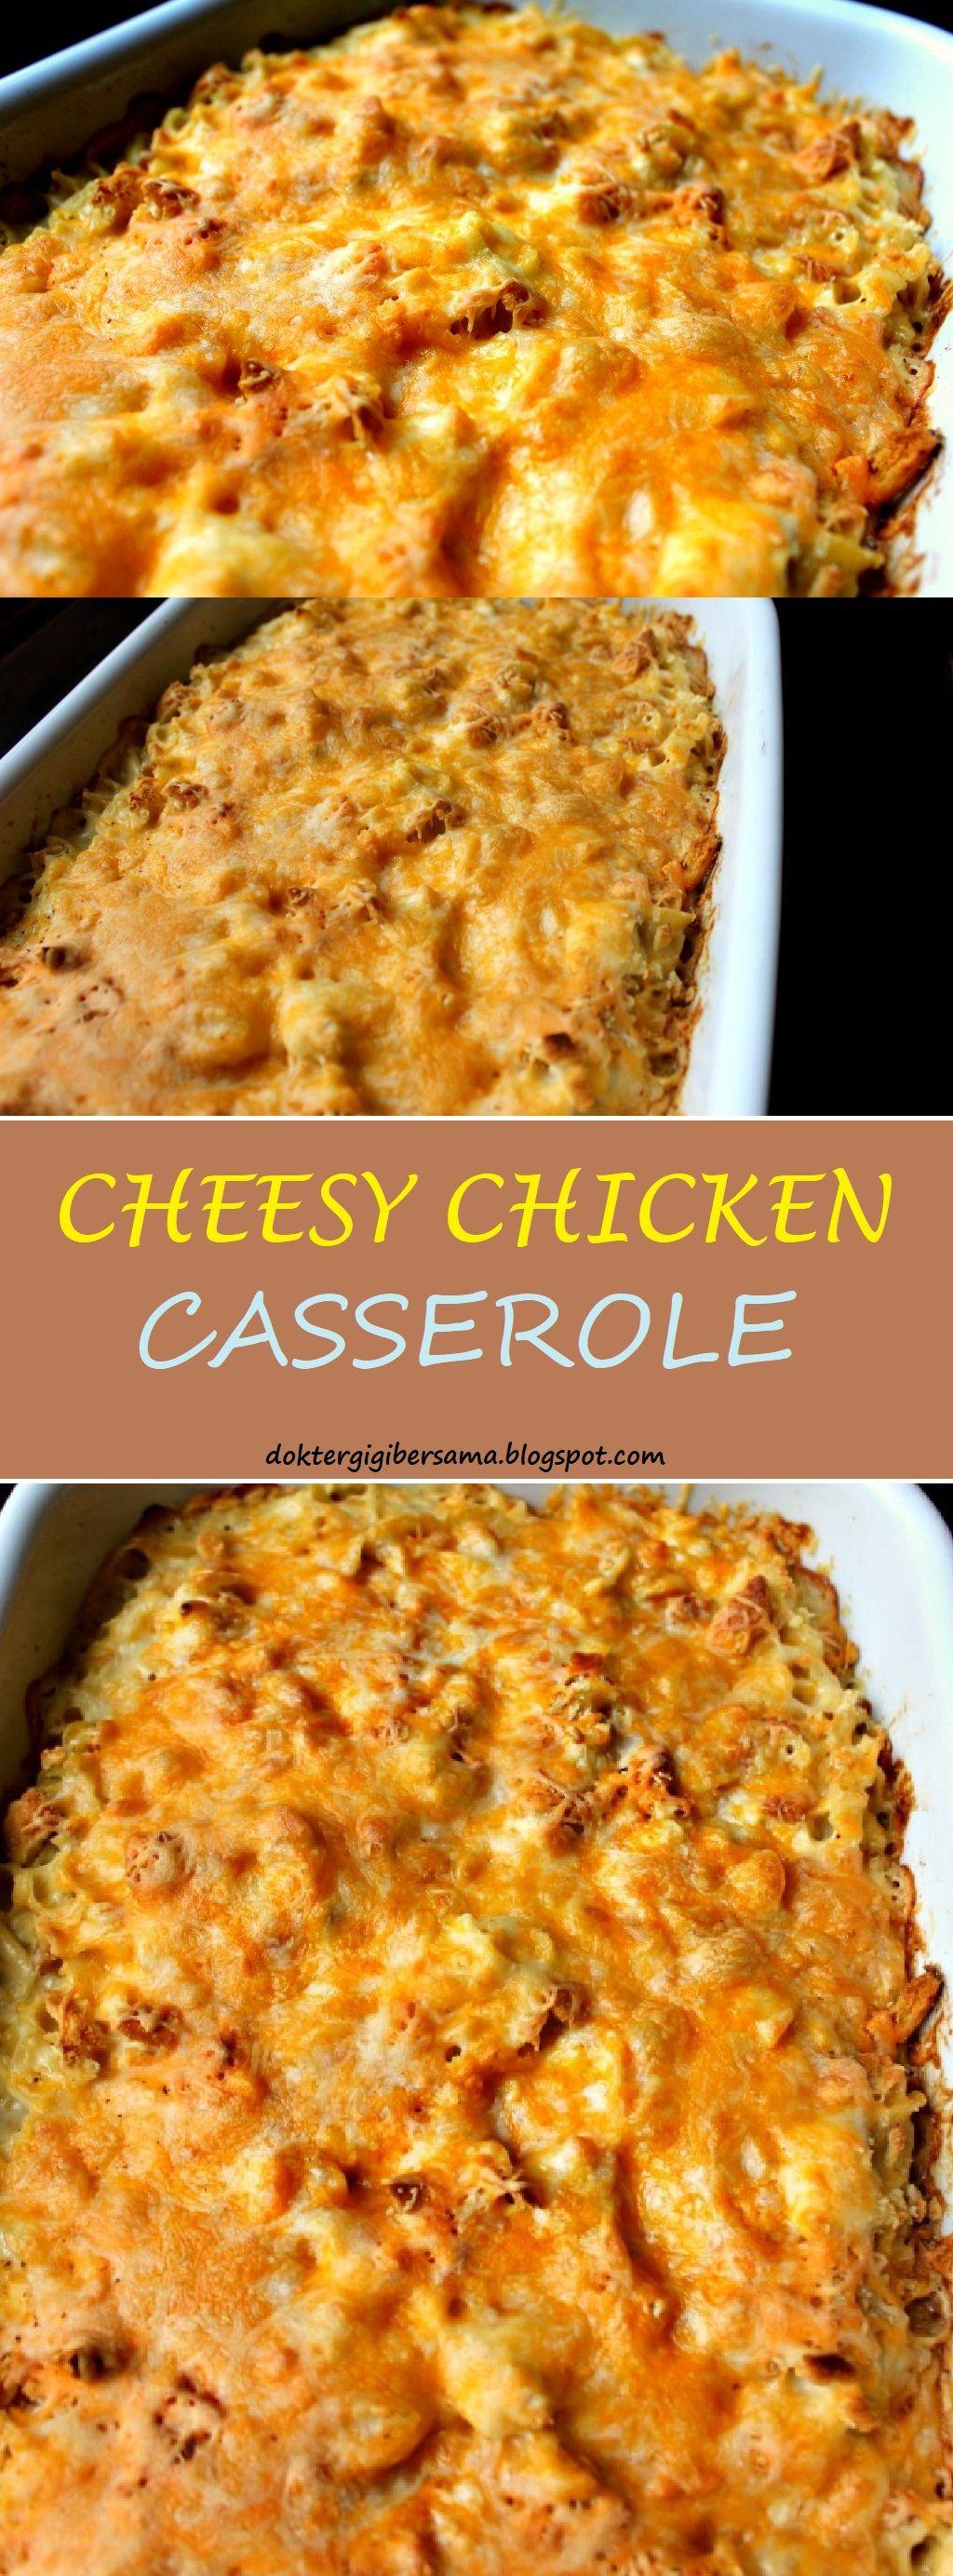 Cheesy chicken casserole chicken recipes casserole